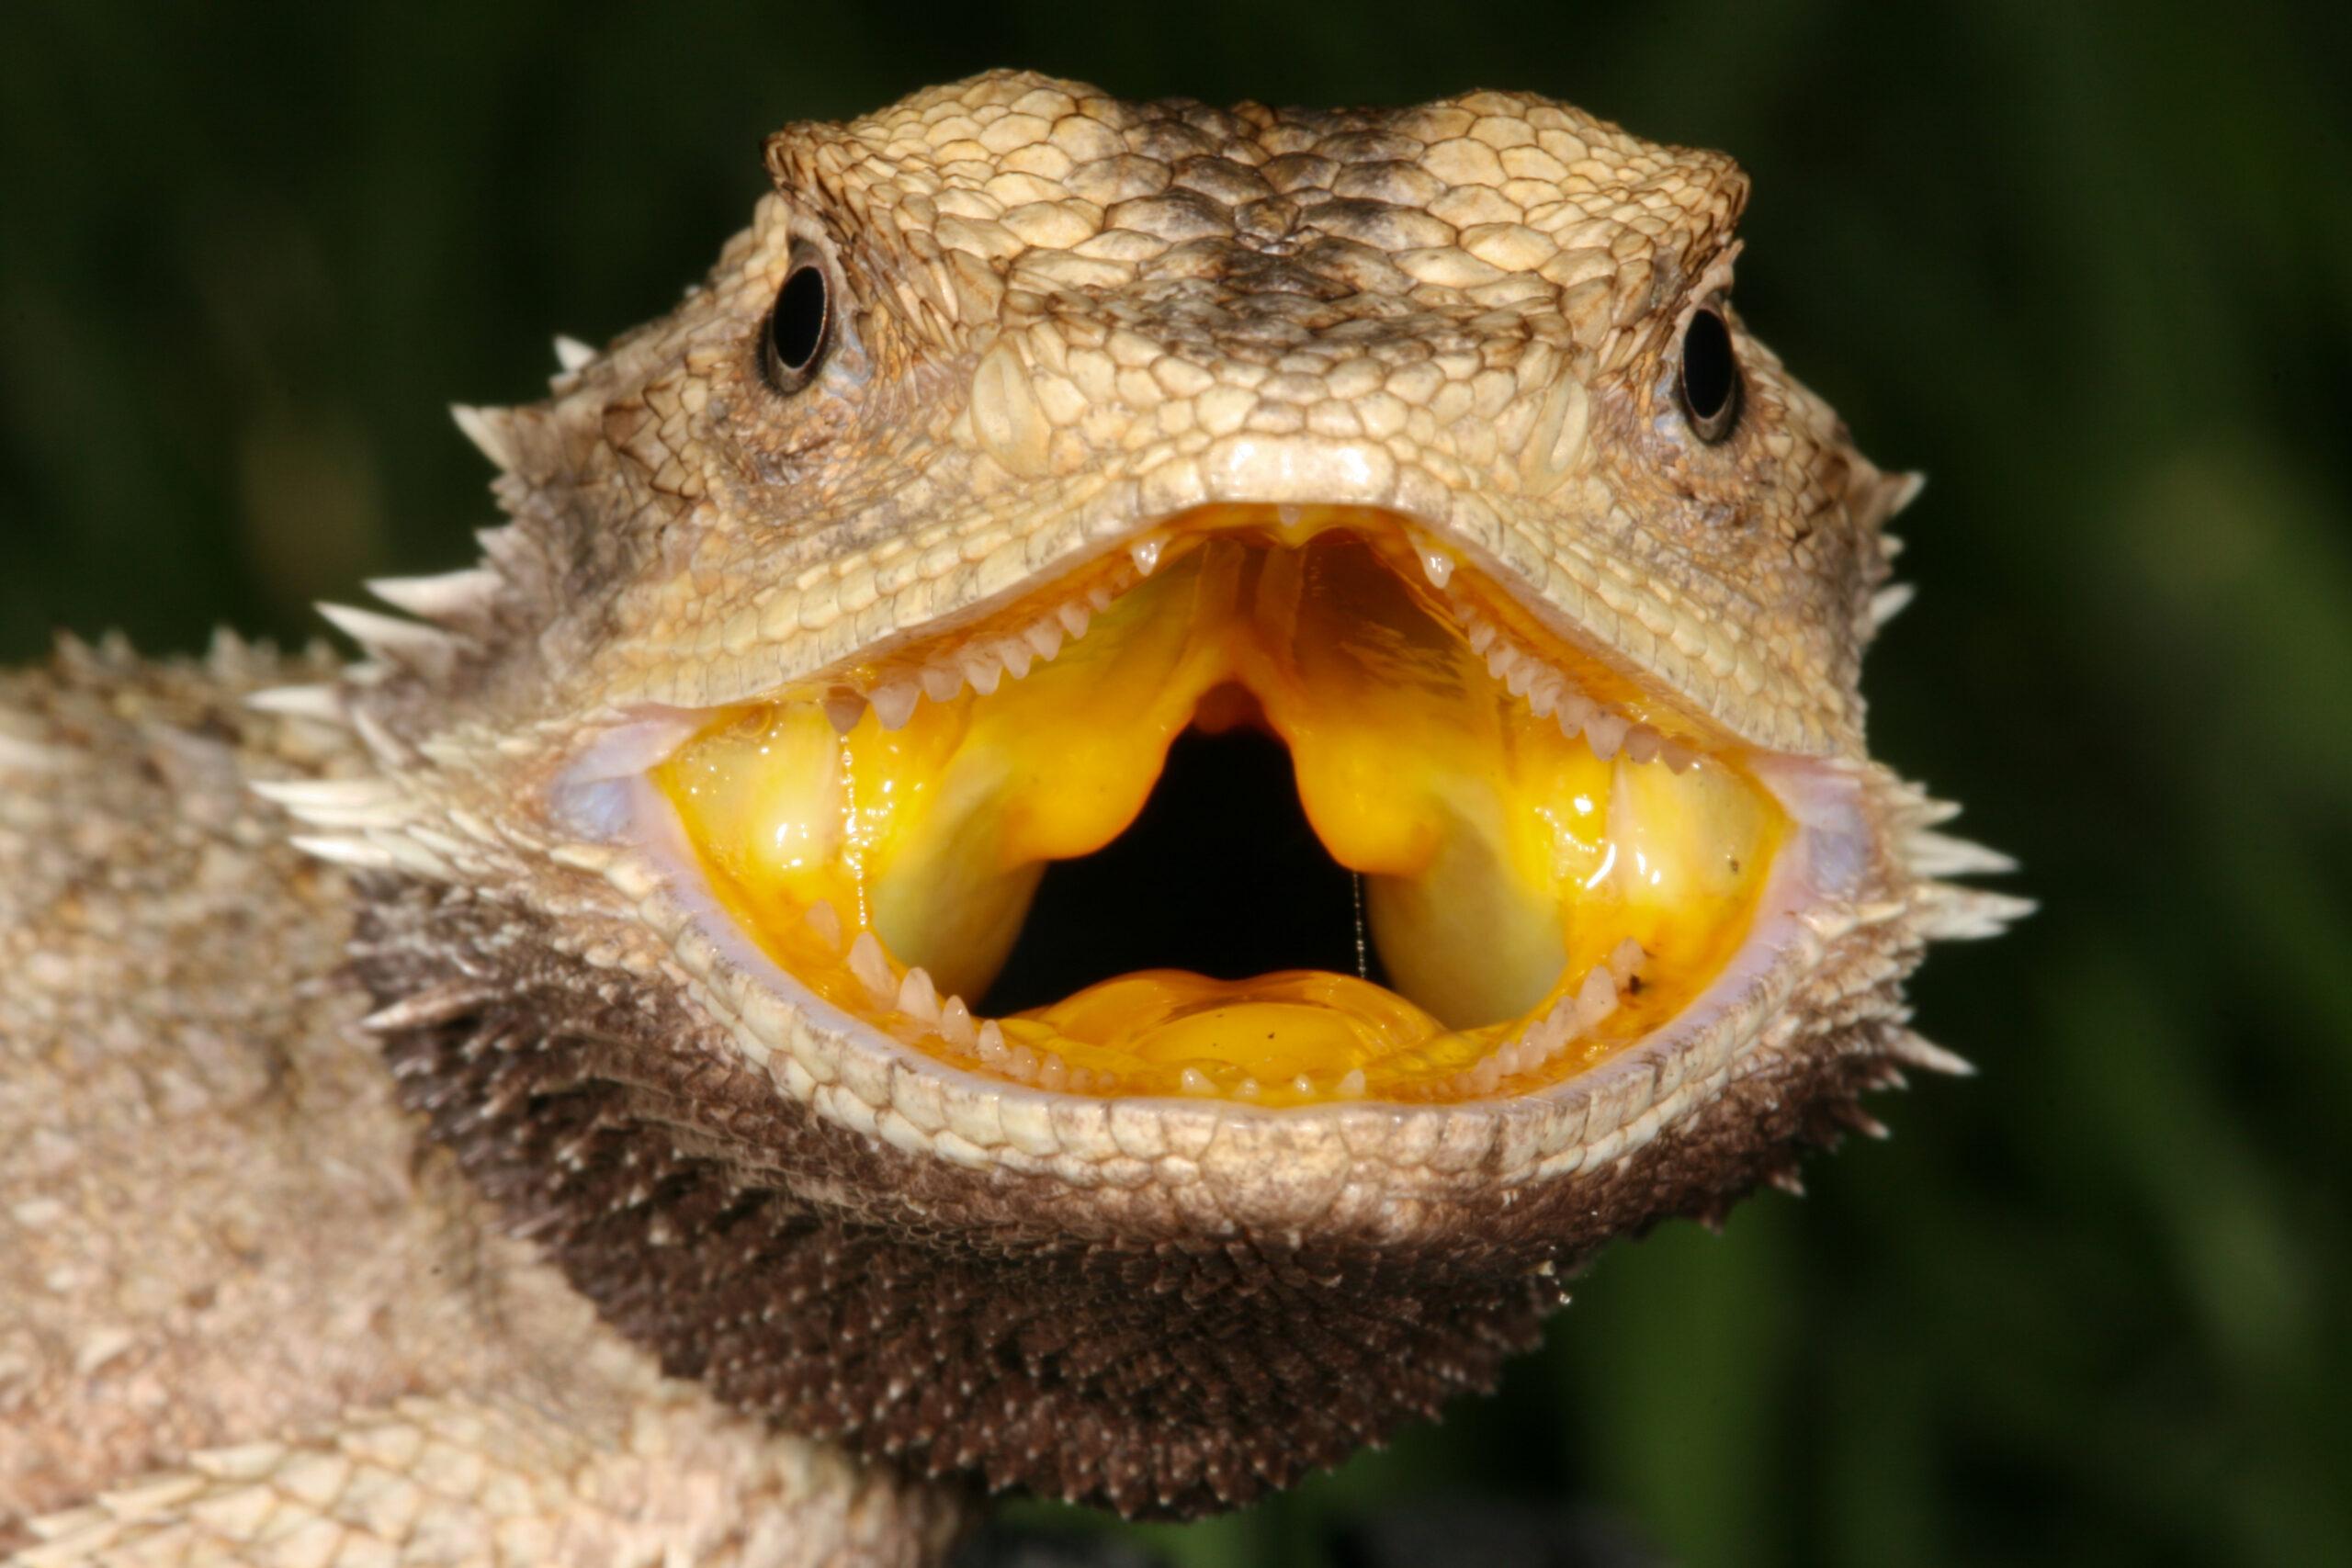 Western Bearded Dragon, Pogona minor